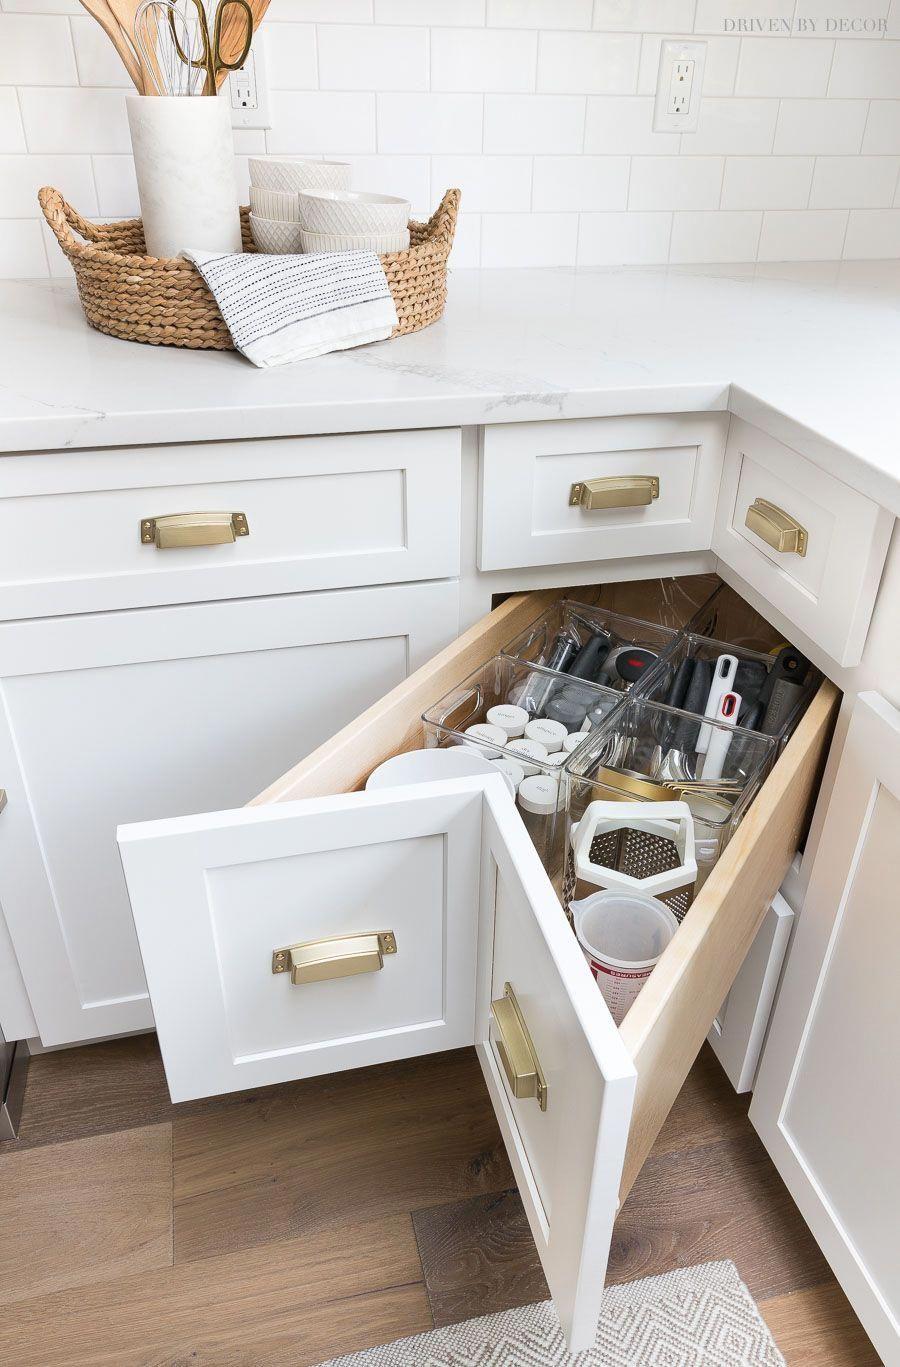 Kitchen Cabinet Storage Organization Ideas Driven By Decor Kitchen Remodel Small Kitchen Design Small Home Decor Kitchen